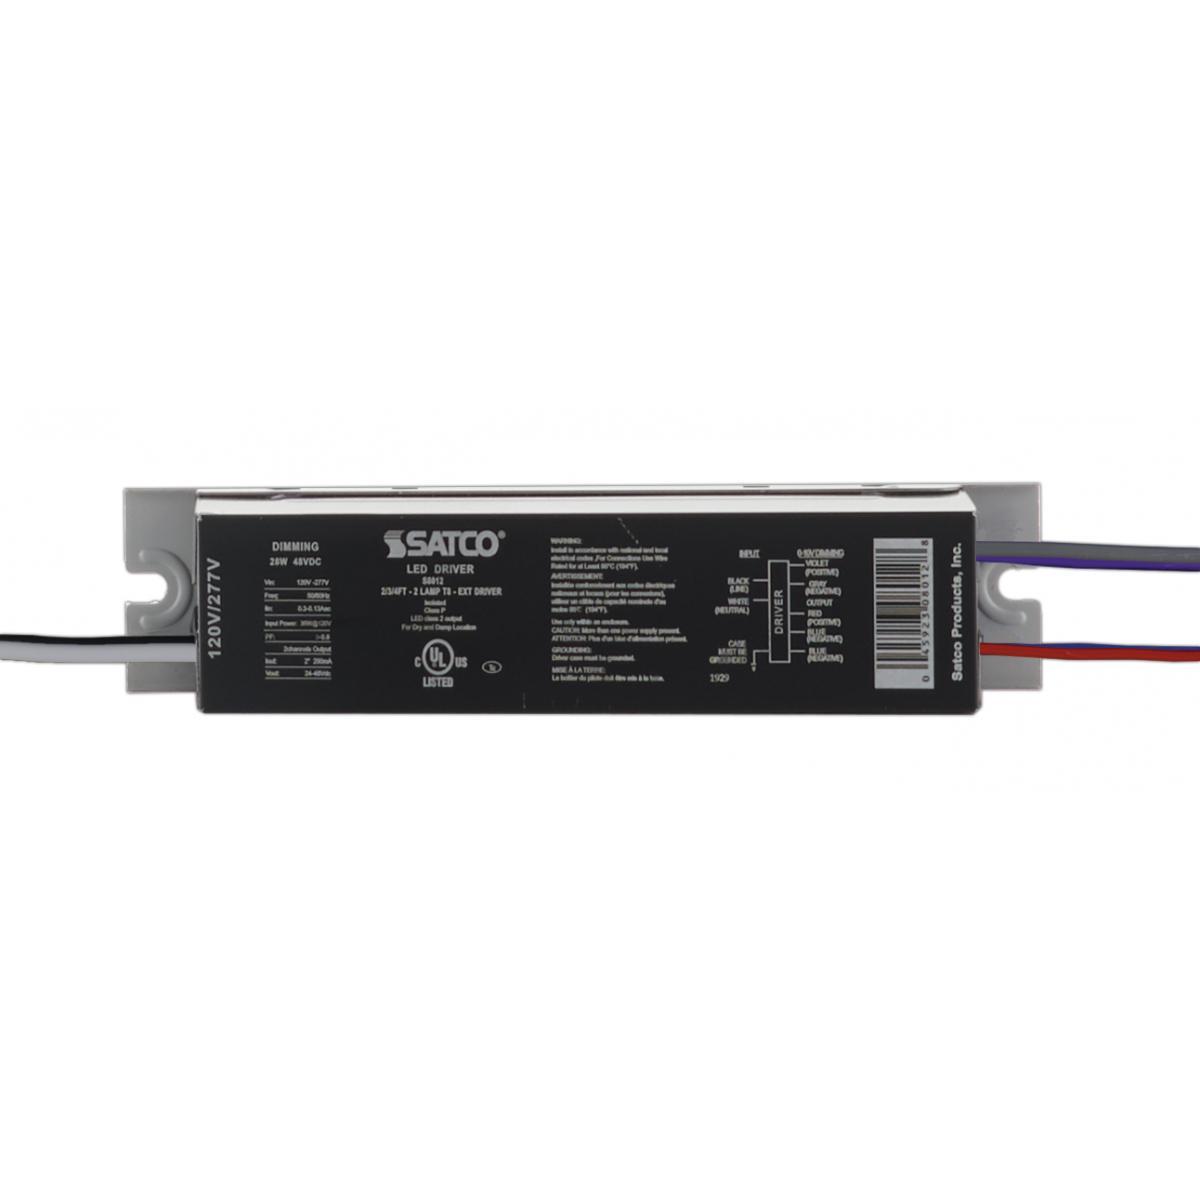 S8012 2/3/4FT - 2 LAMP T8 - EXT DRIV